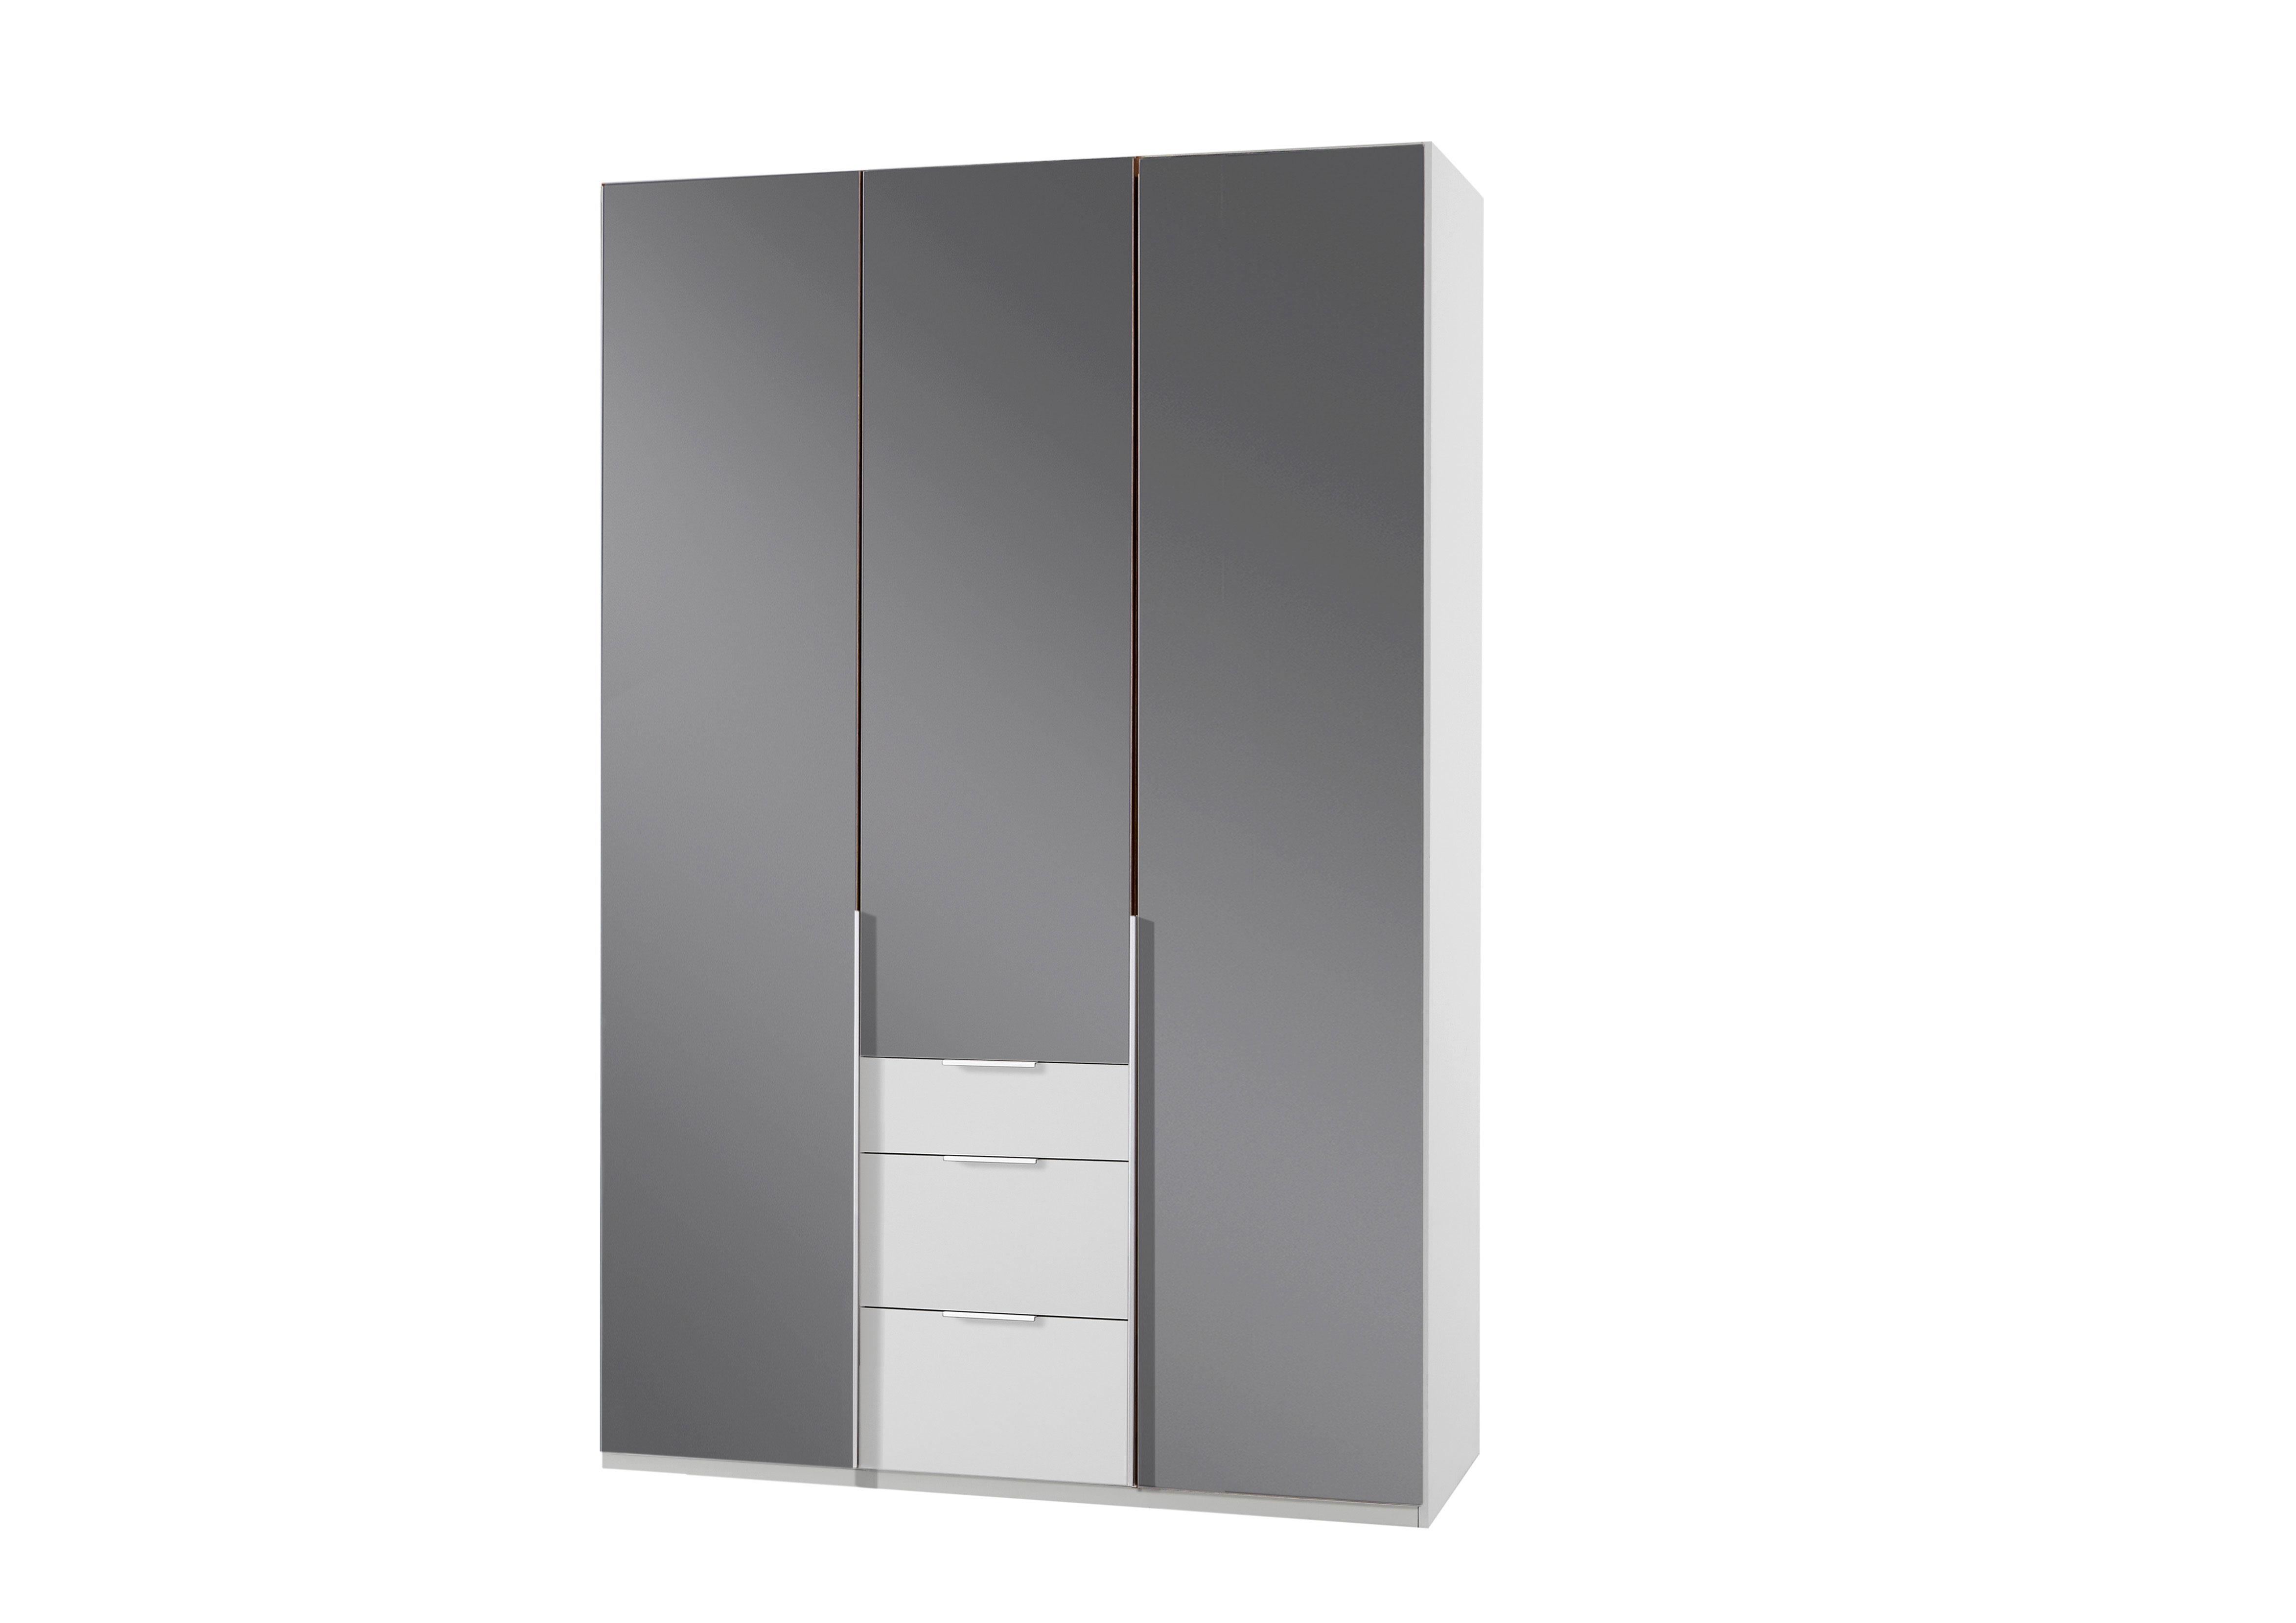 Armoire design 3 portes/3 tiroirs blanc alpin/verre gris Tony